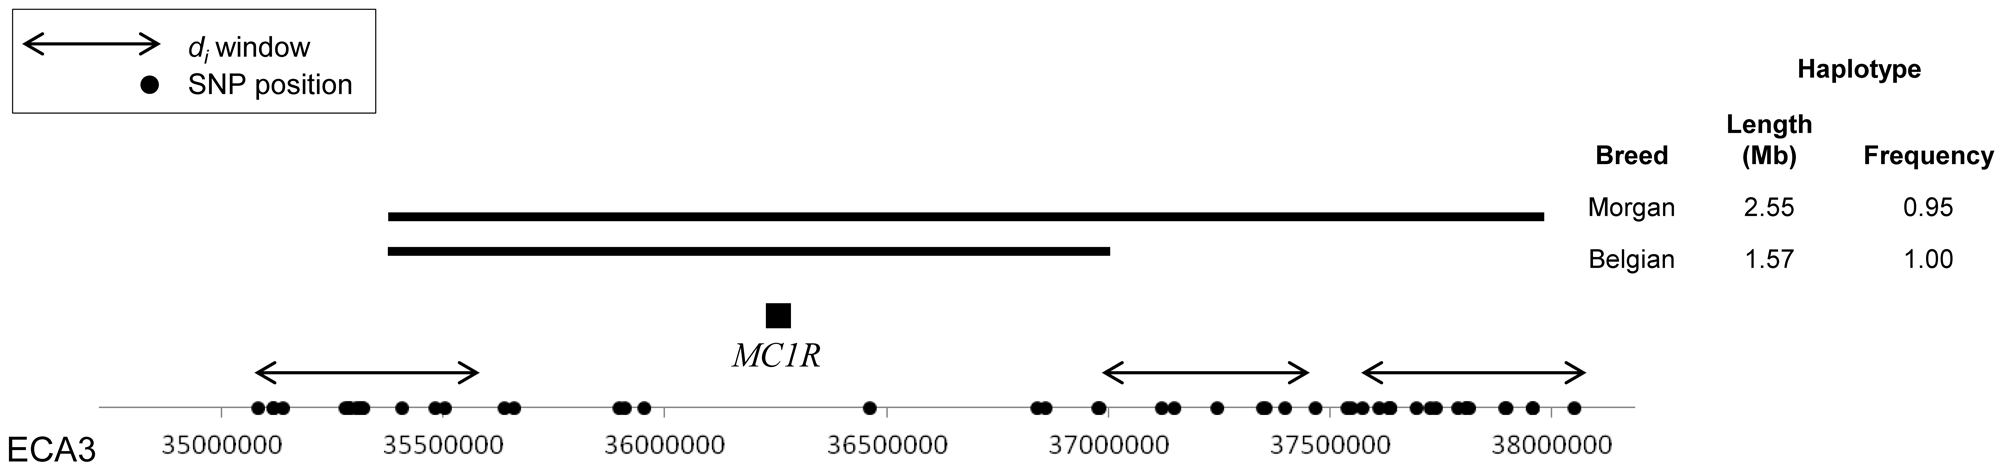 Haplotypes surrounding the <i>MC1R</i> locus in the Morgan and Belgian.